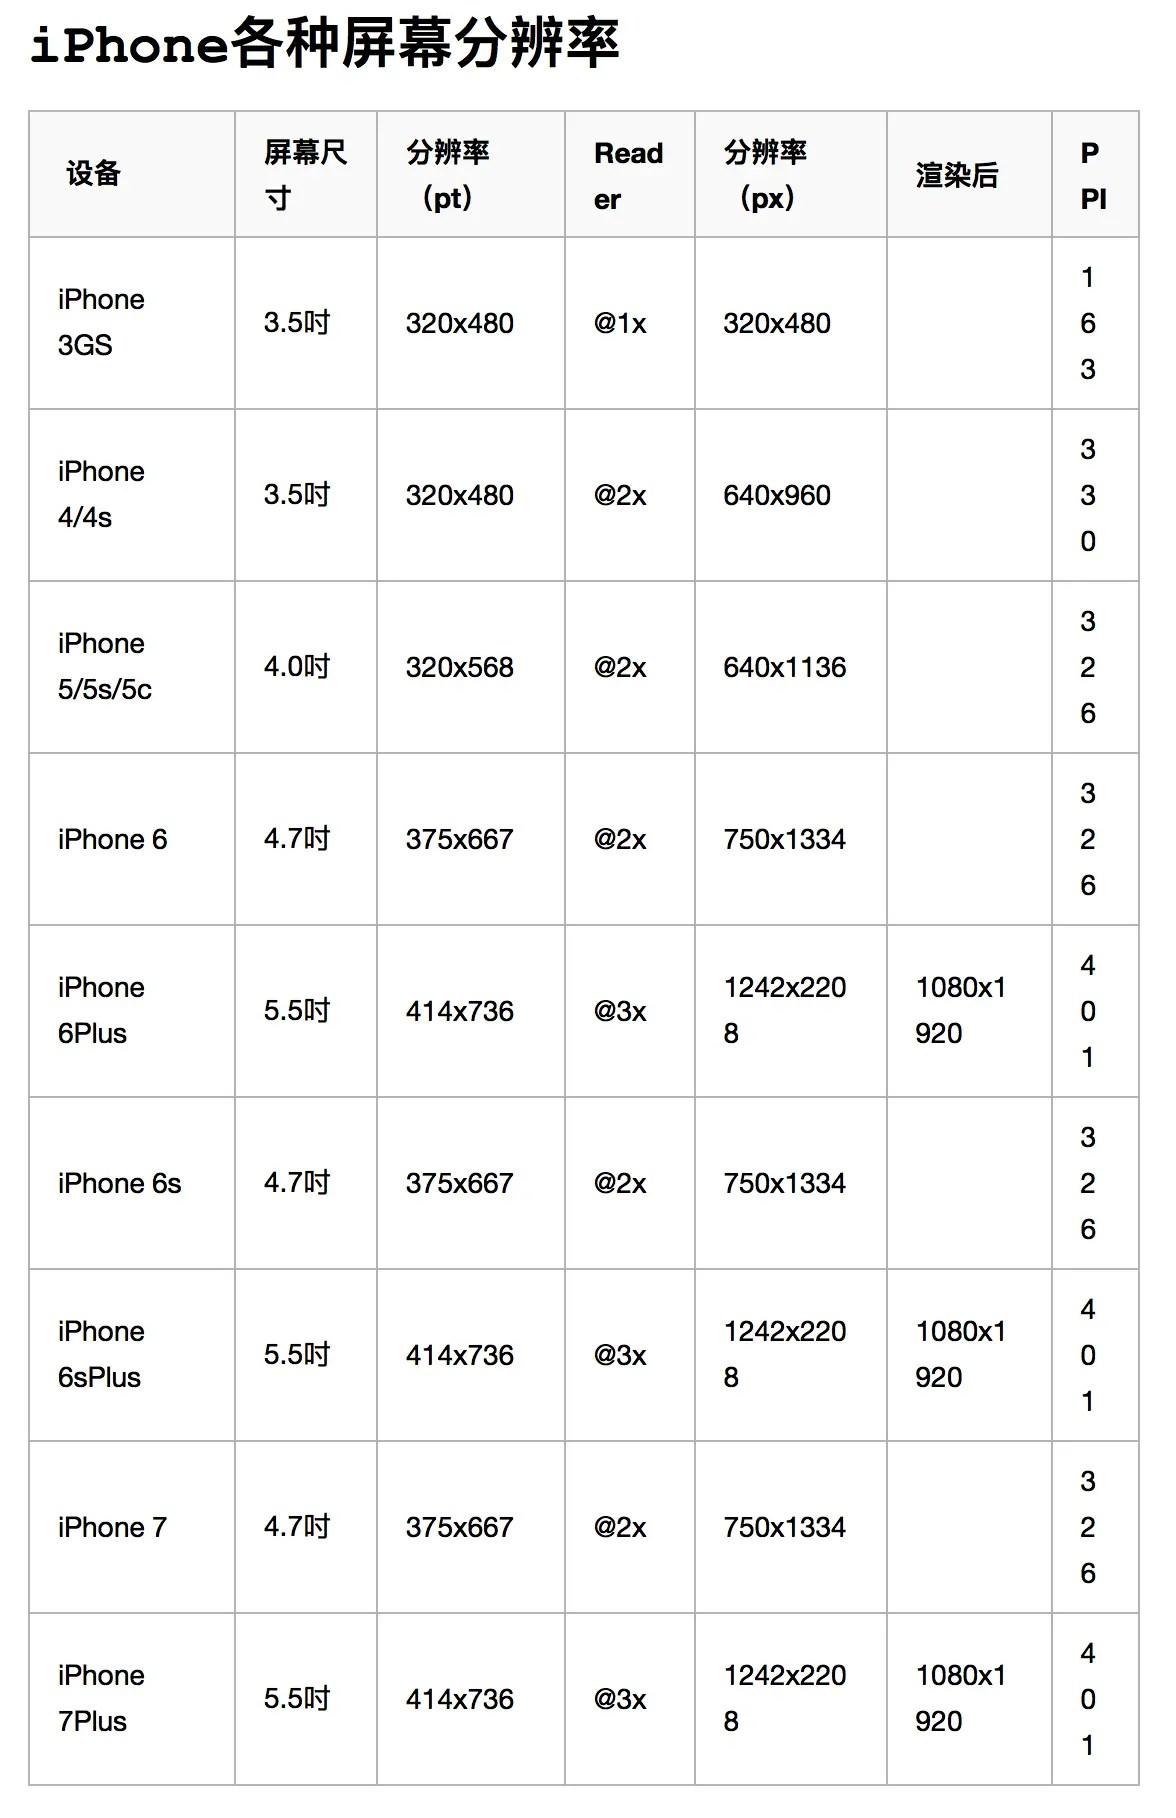 iPhone各種機型尺寸、屏幕分辨率 - 簡書